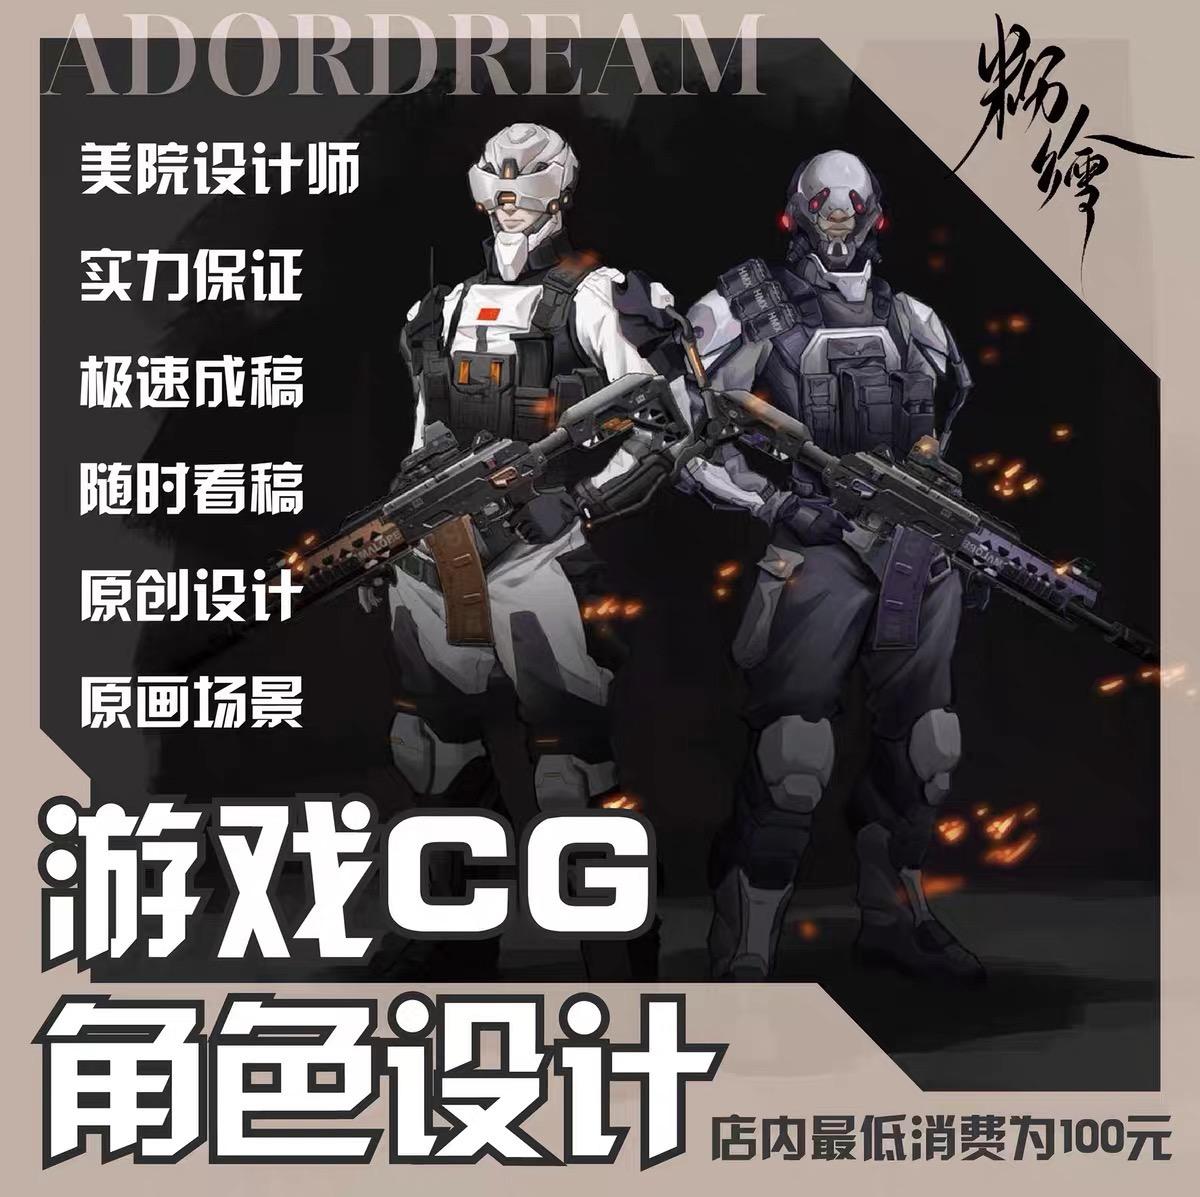 PS游戏角色设计 立绘三视图厚涂CG商业插画原画约稿道具定制